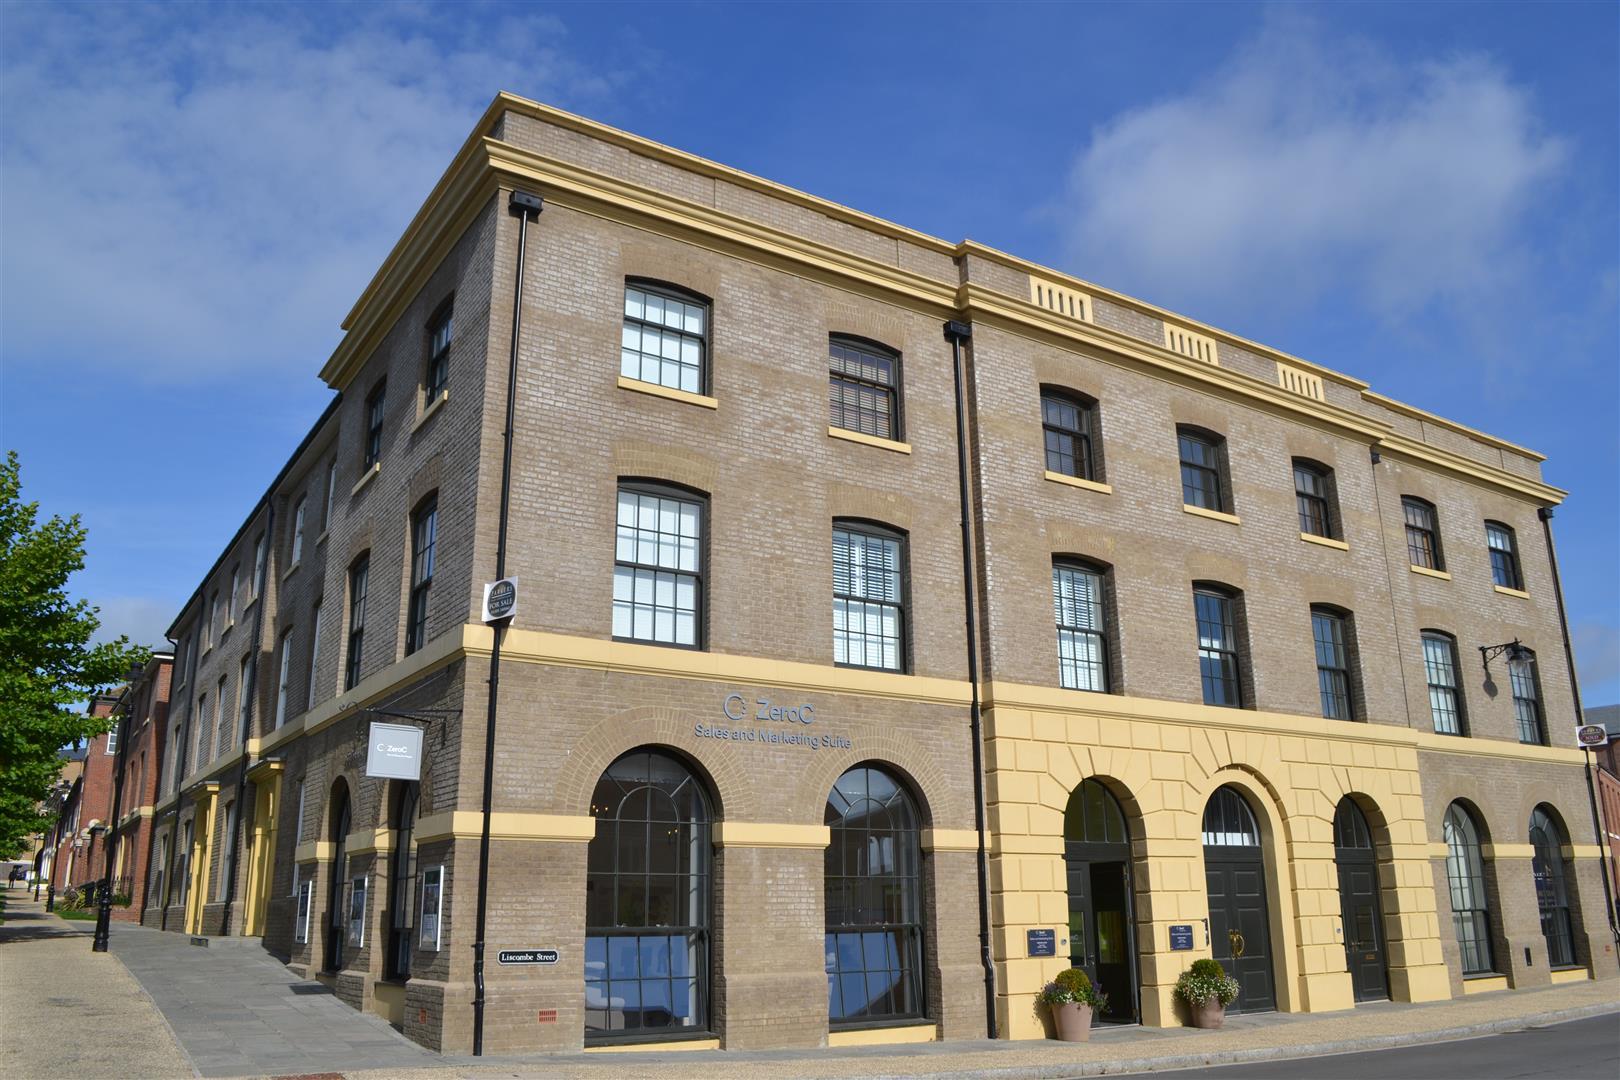 1 Liscombe Street, Poundbury, Dorchester